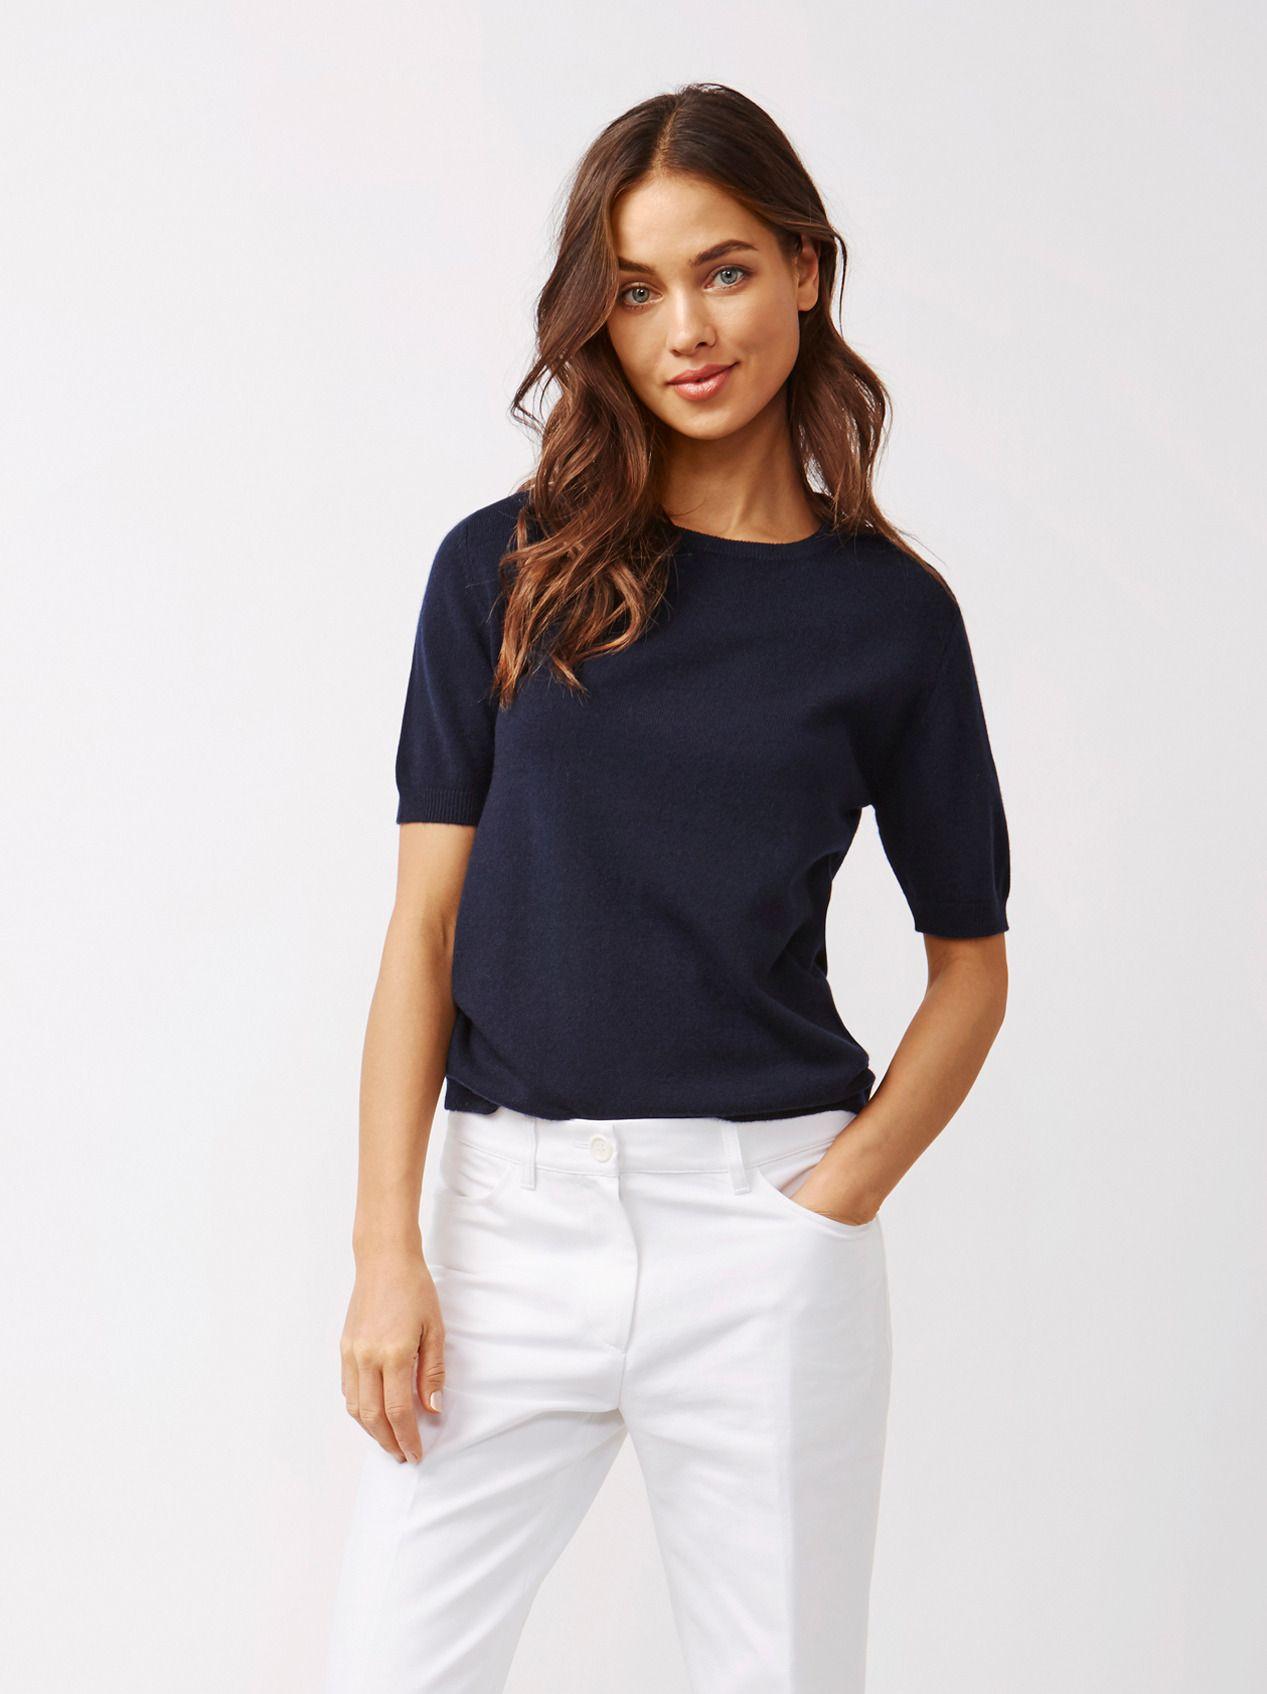 89f9b6018 Soft Goat Women's Short Sleeve O-Neck Navy | Cashmere o stickat ...